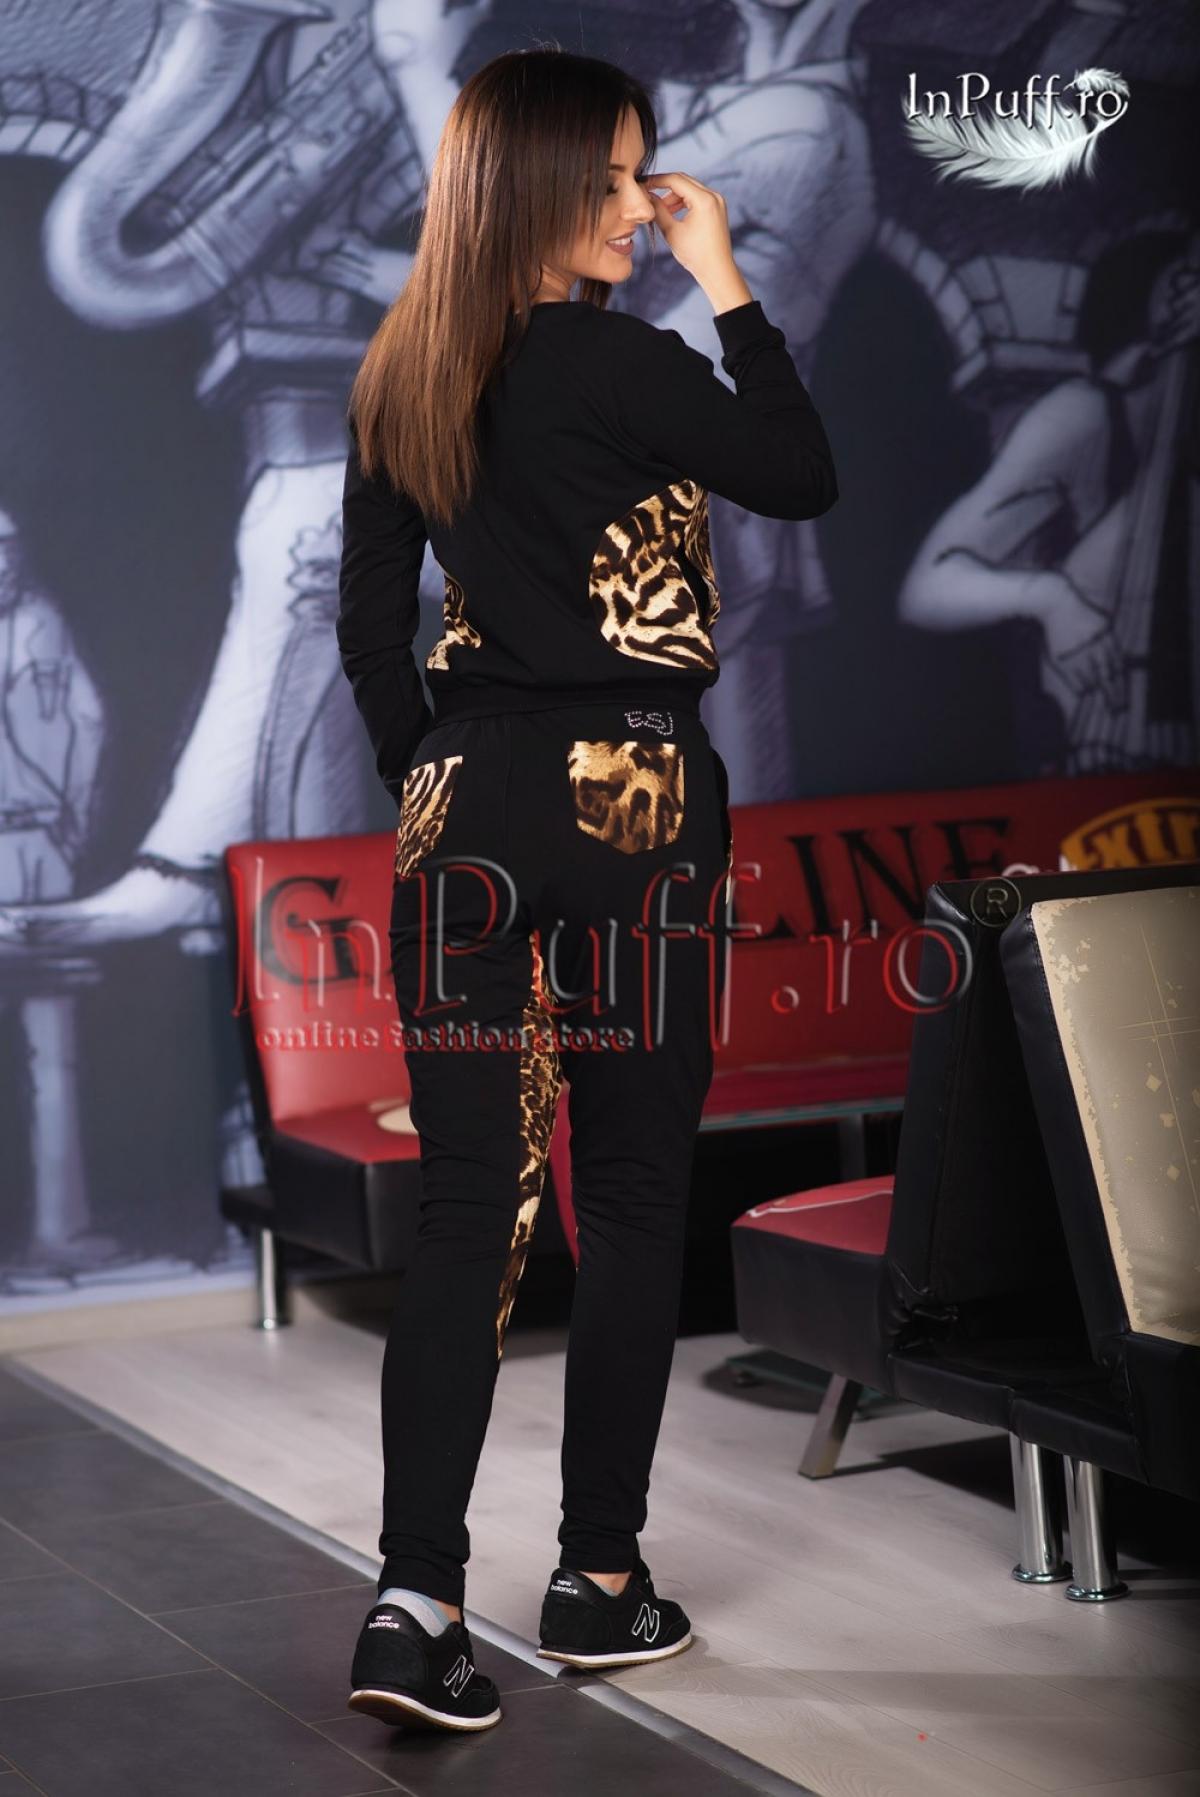 Trening dama bumbac negru cu animal print